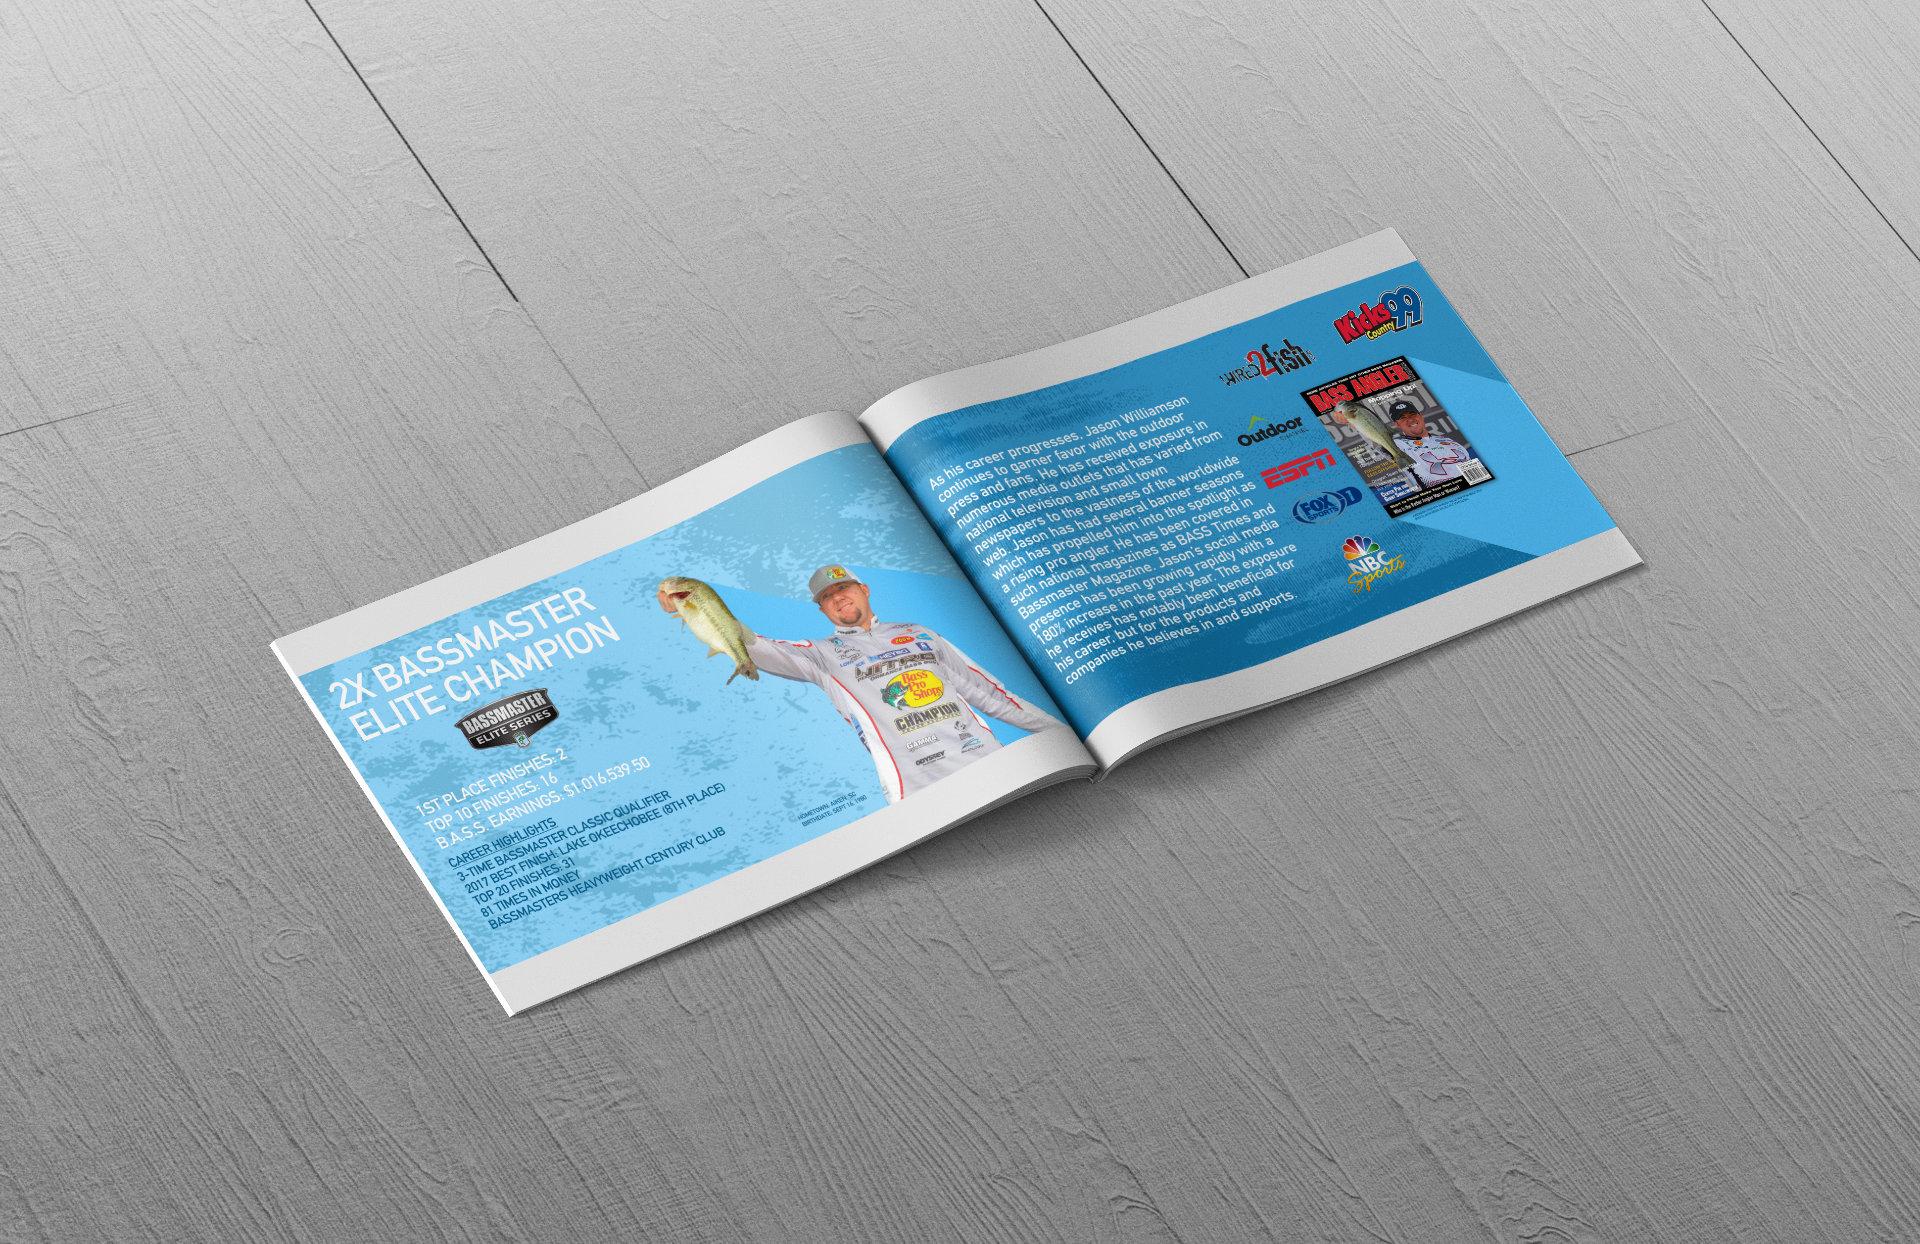 Angler Media Kits